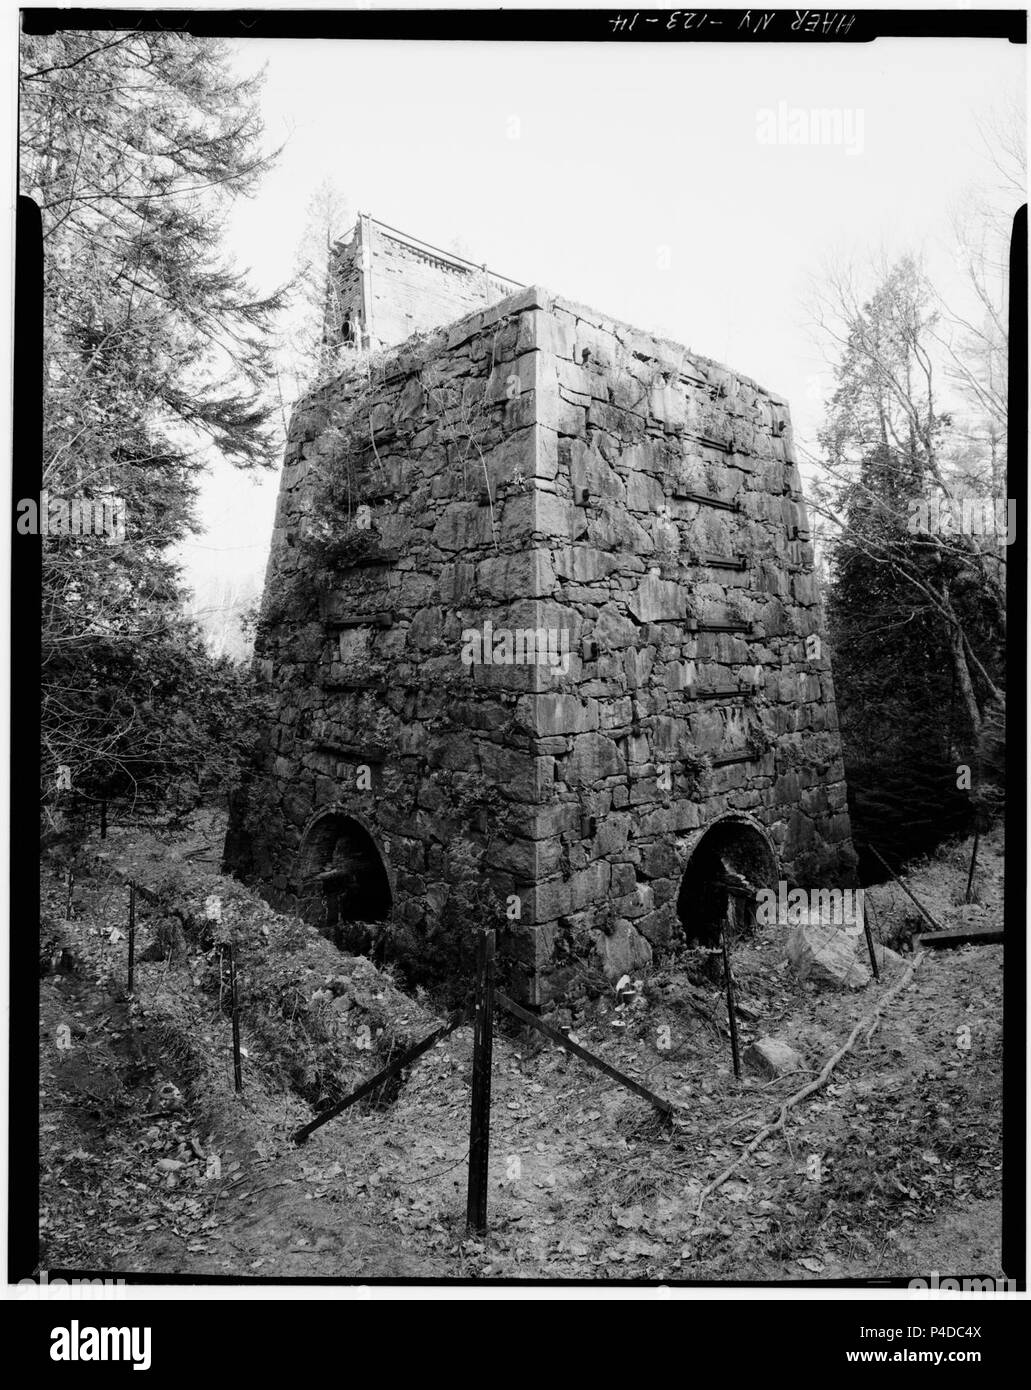 14. Jet Lowe, Photographer, June 1978. MCINTYRE IRON WORKS. VIEW SOUTHEAST OF TOWER. - Adirondack Iron ^ Steel Company, - LOC - hhh.ny0915.photos.116619p. - Stock Image